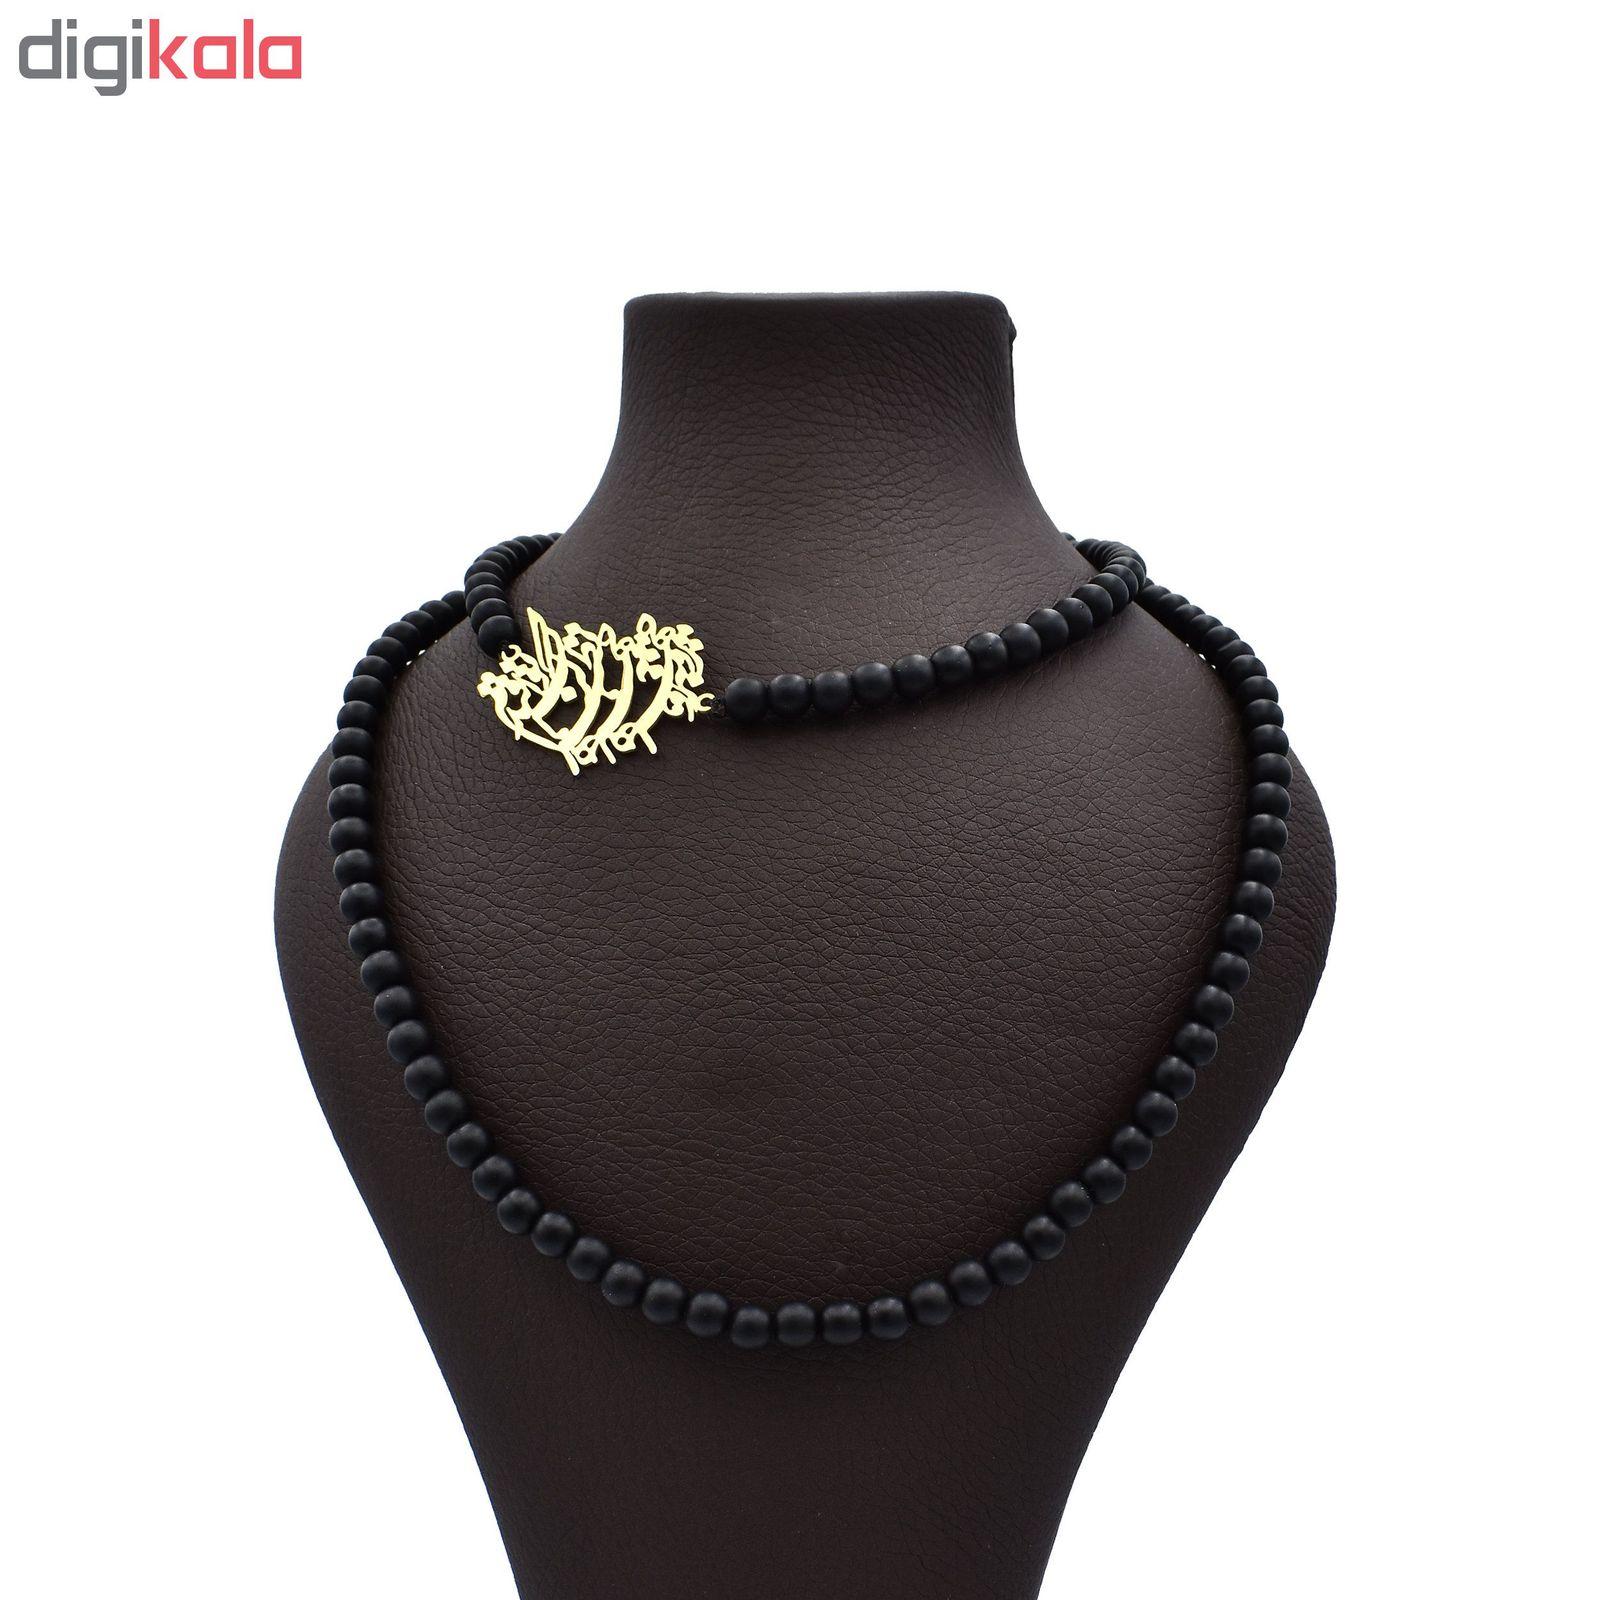 گردنبند طلا 18 عیار زنانه آرشا گالری طرح شعر اسلیمی کد 326A2453 main 1 1